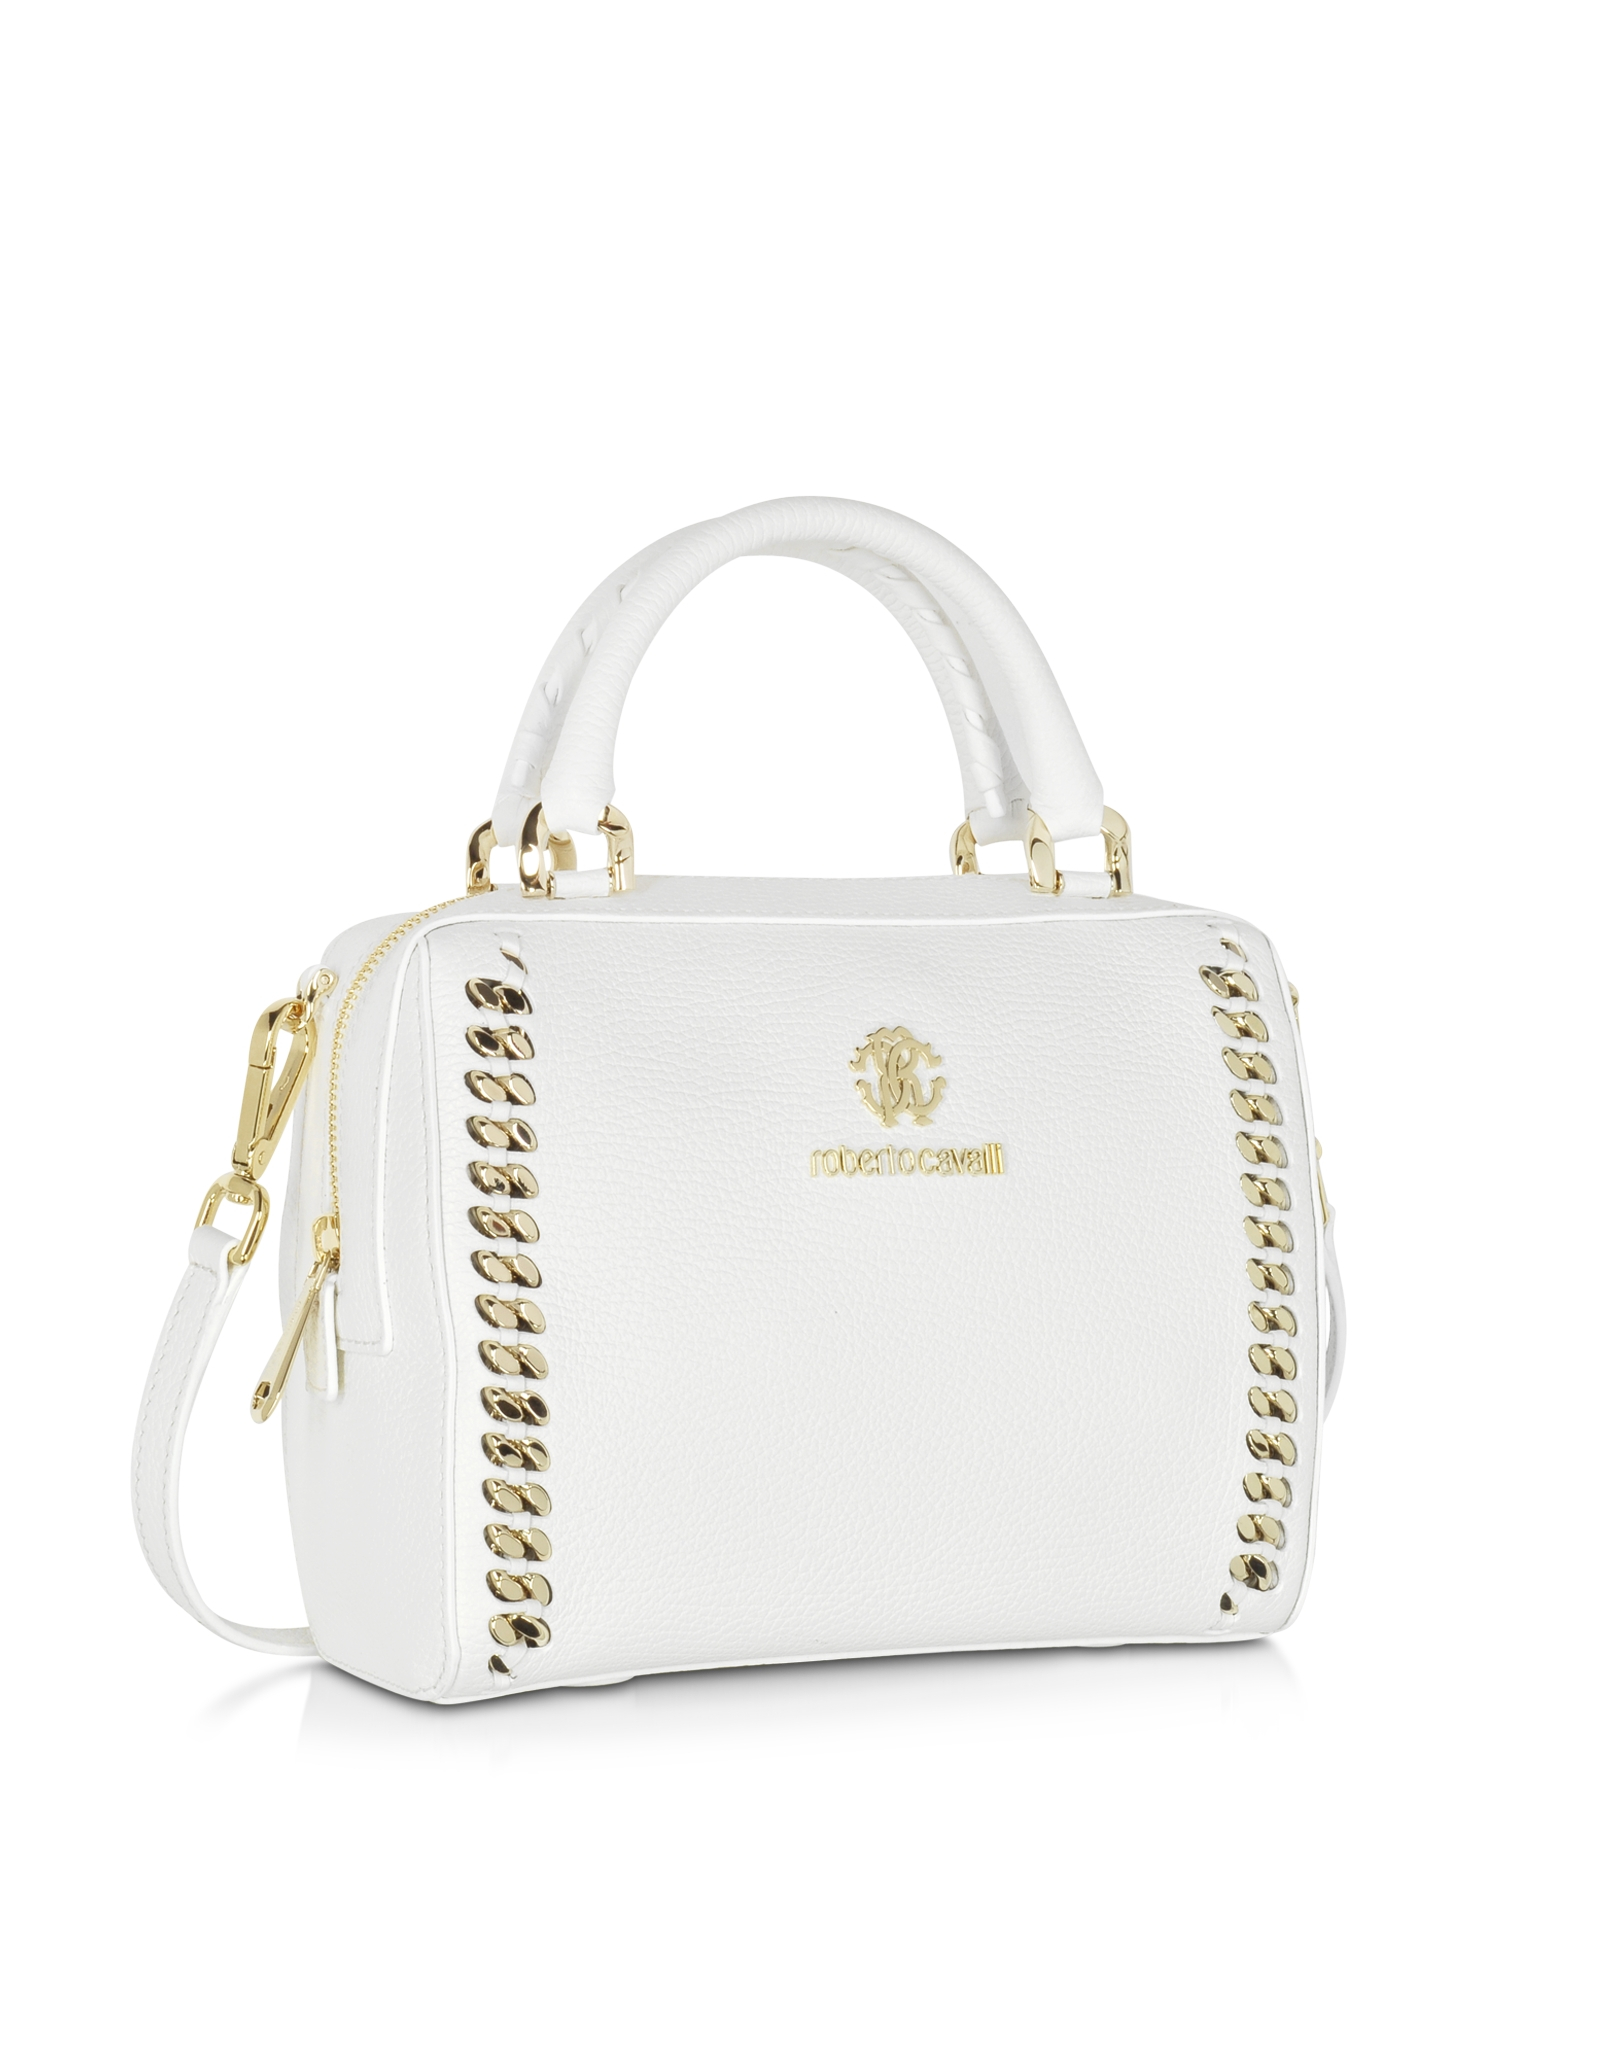 Roberto cavalli Boston Mini Off White Leather Handbag in White | Lyst